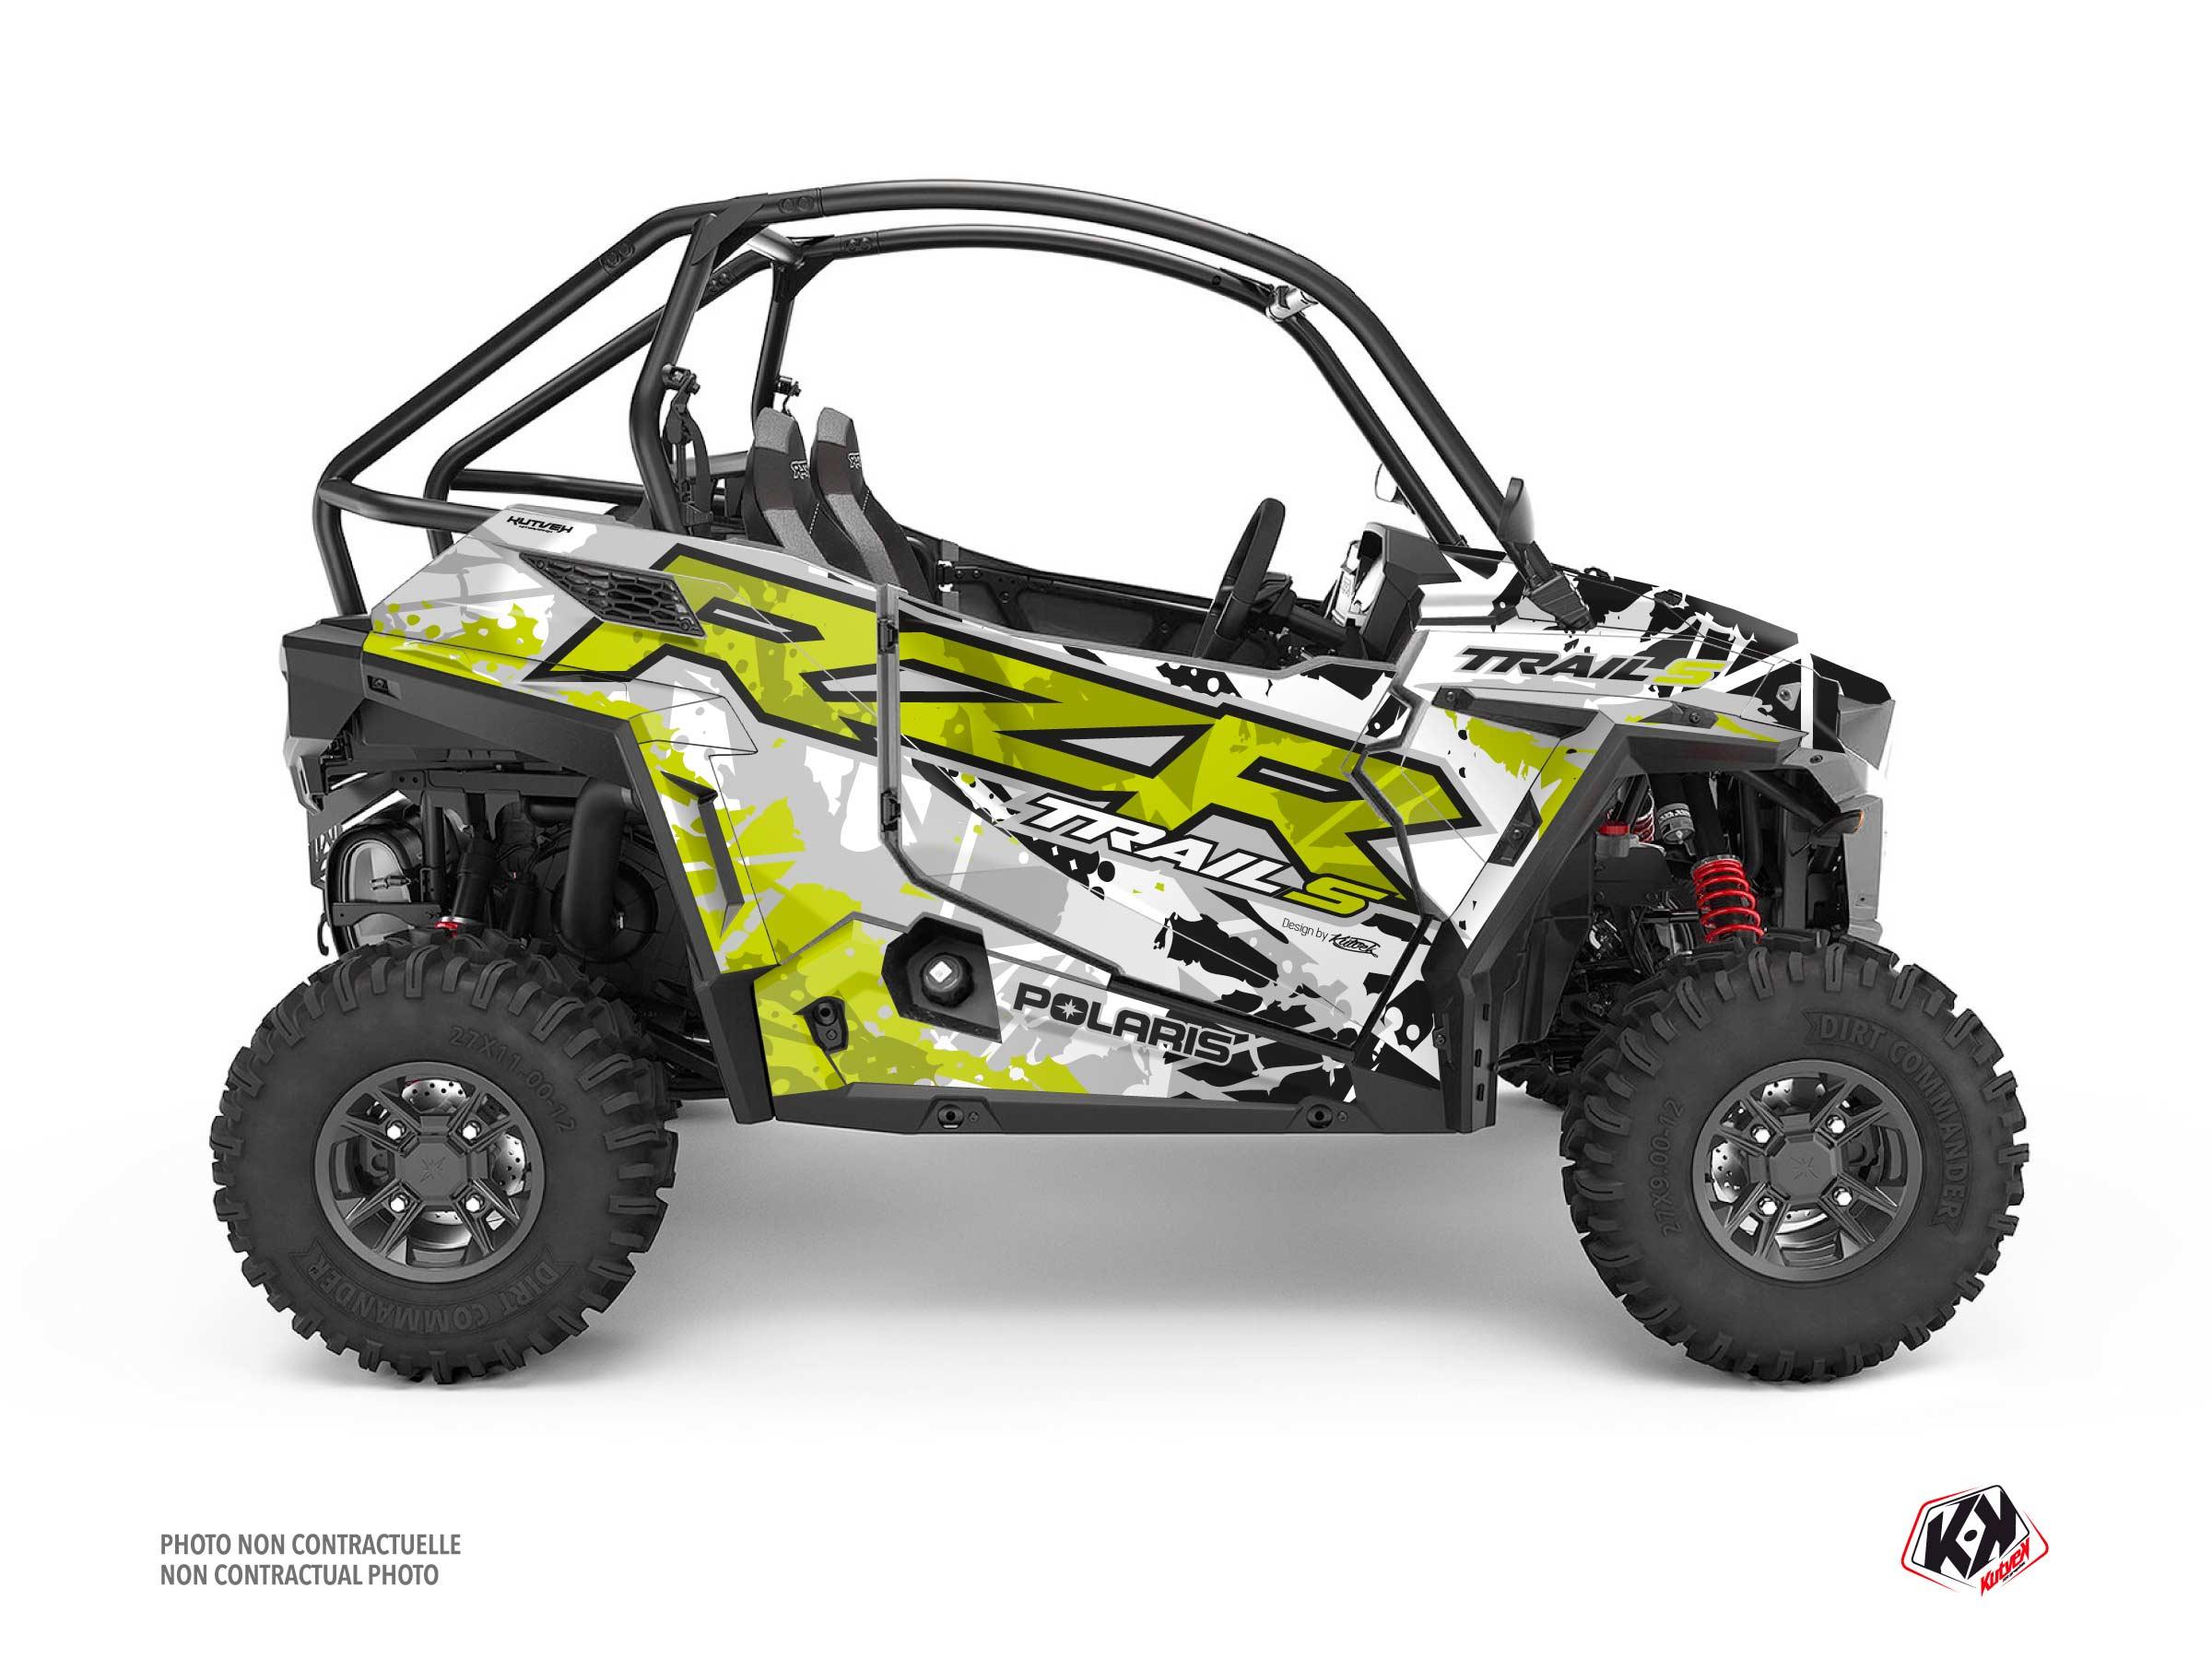 Polaris RZR Trail S UTV v Graphic Kit Green Neon